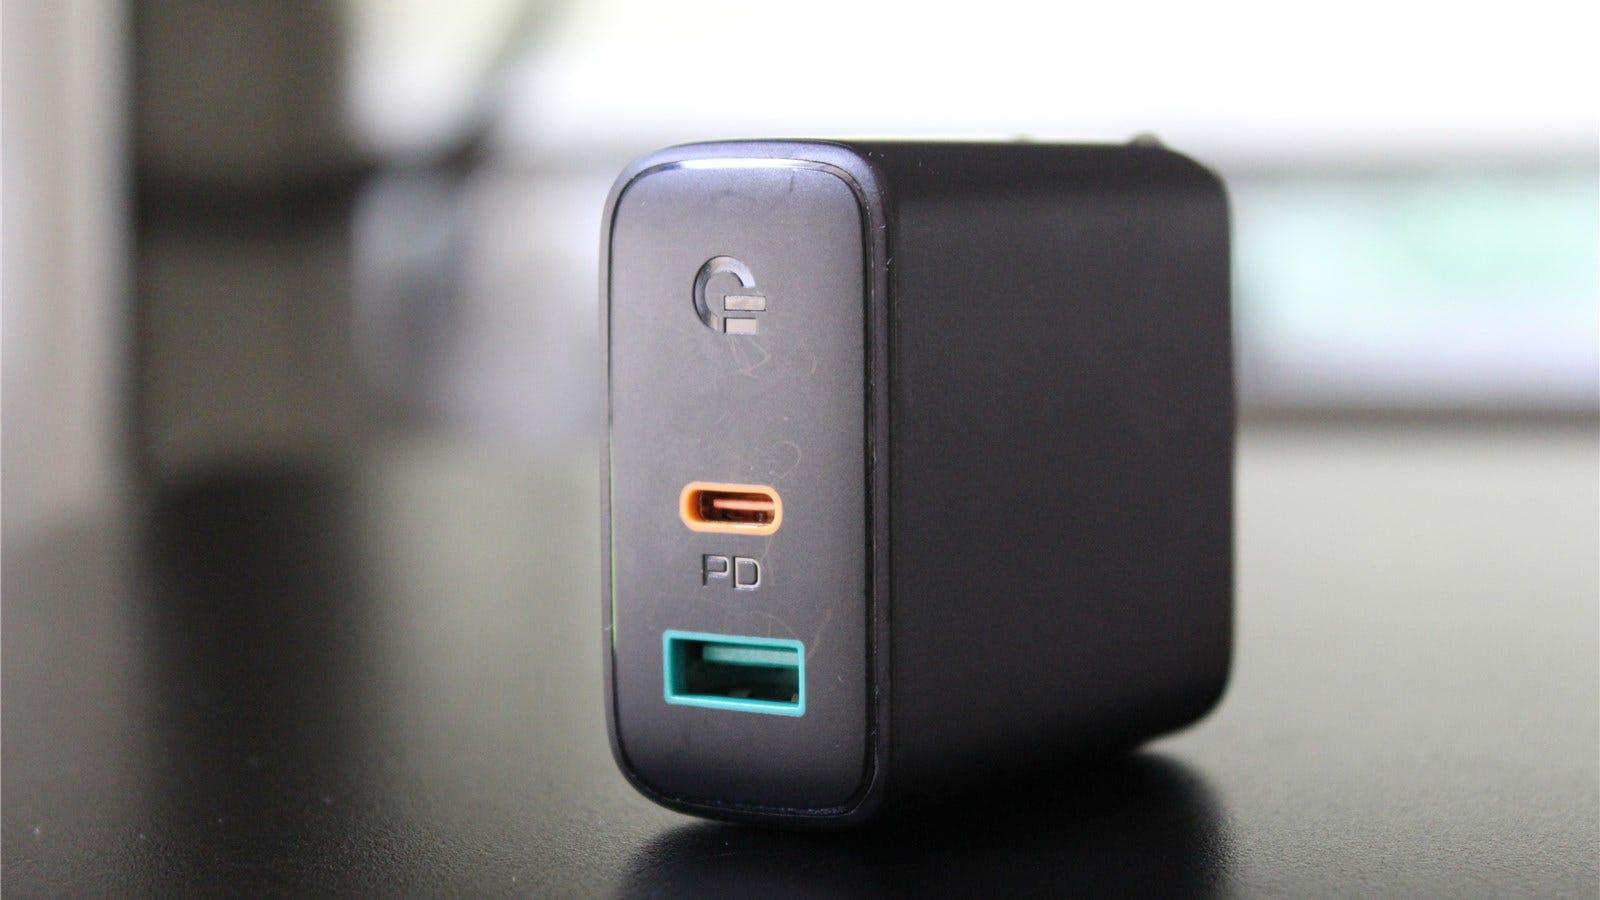 Aukey's 30-watt USB-C PD charger